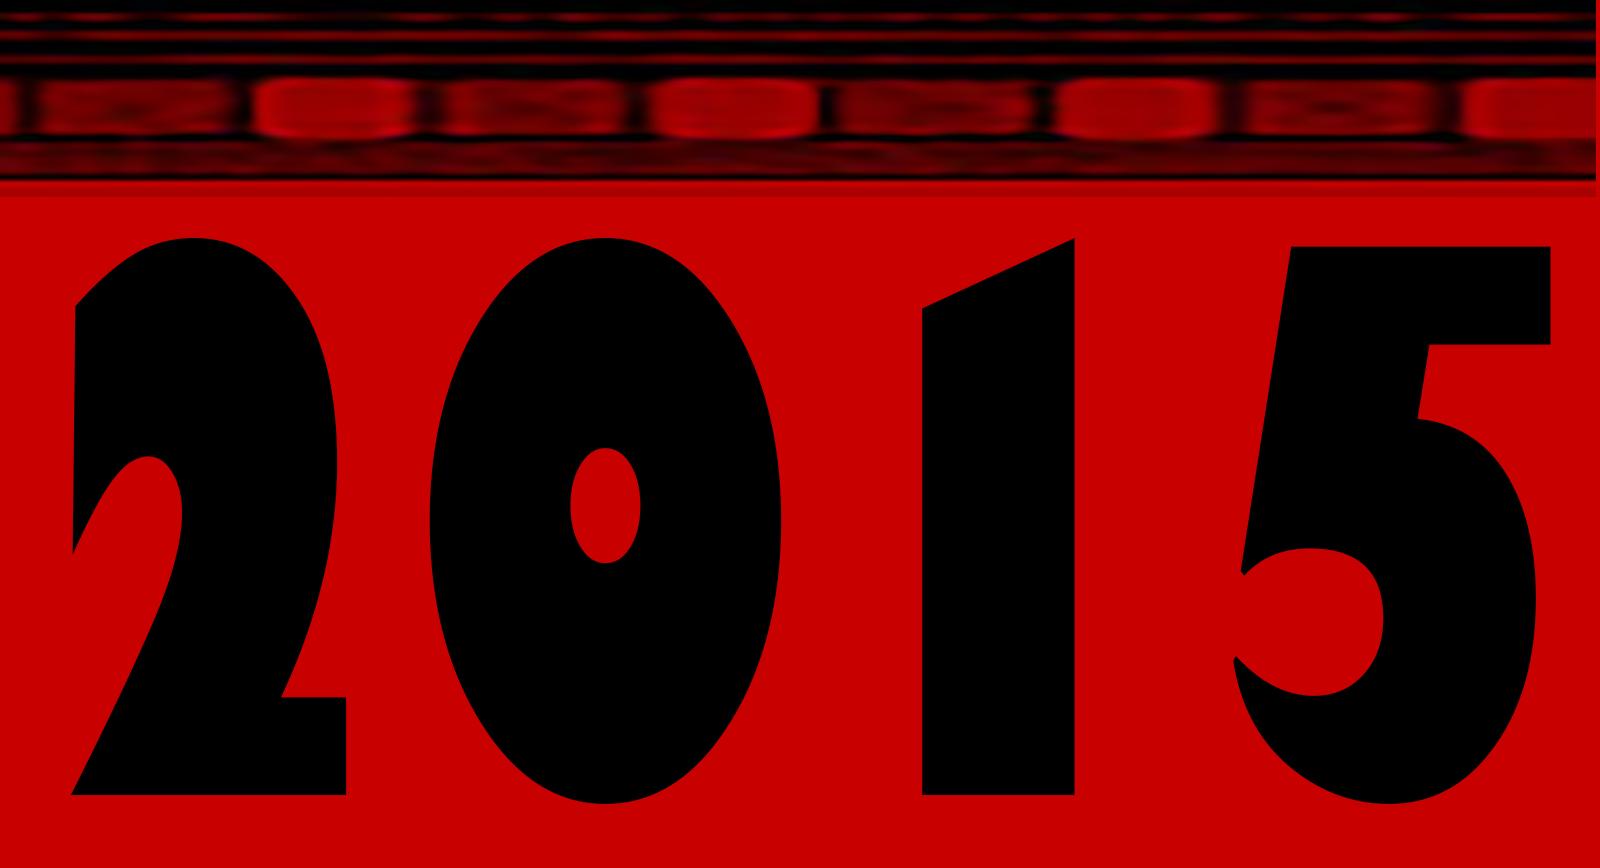 Original-Prop-Blog-2015-Year-In-Review-Editorial-Opinion-Jason-DeBord